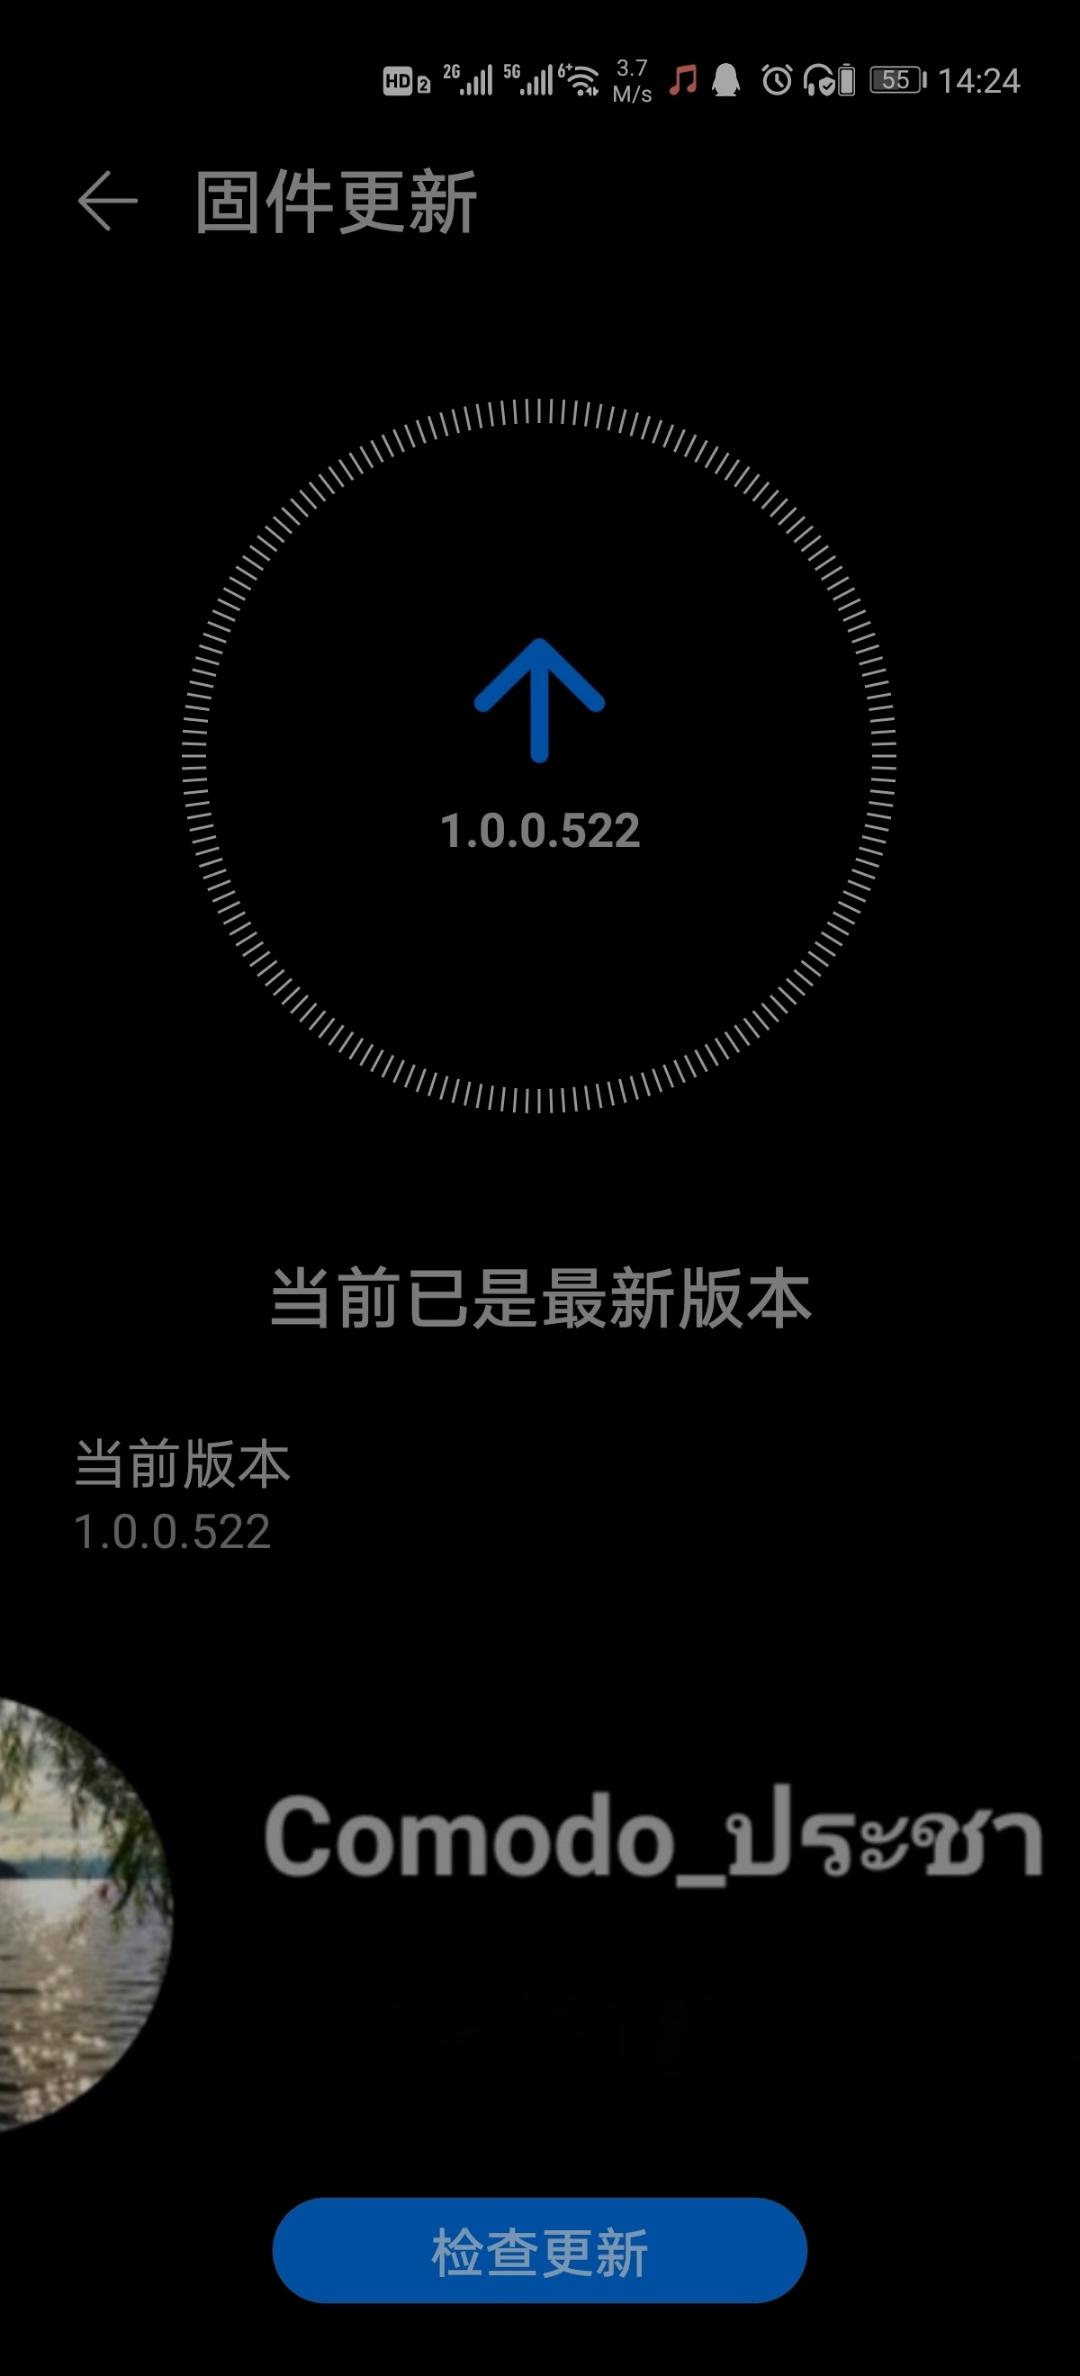 Screenshot_20200513_142458_com.huawei.smarthome-01.jpeg